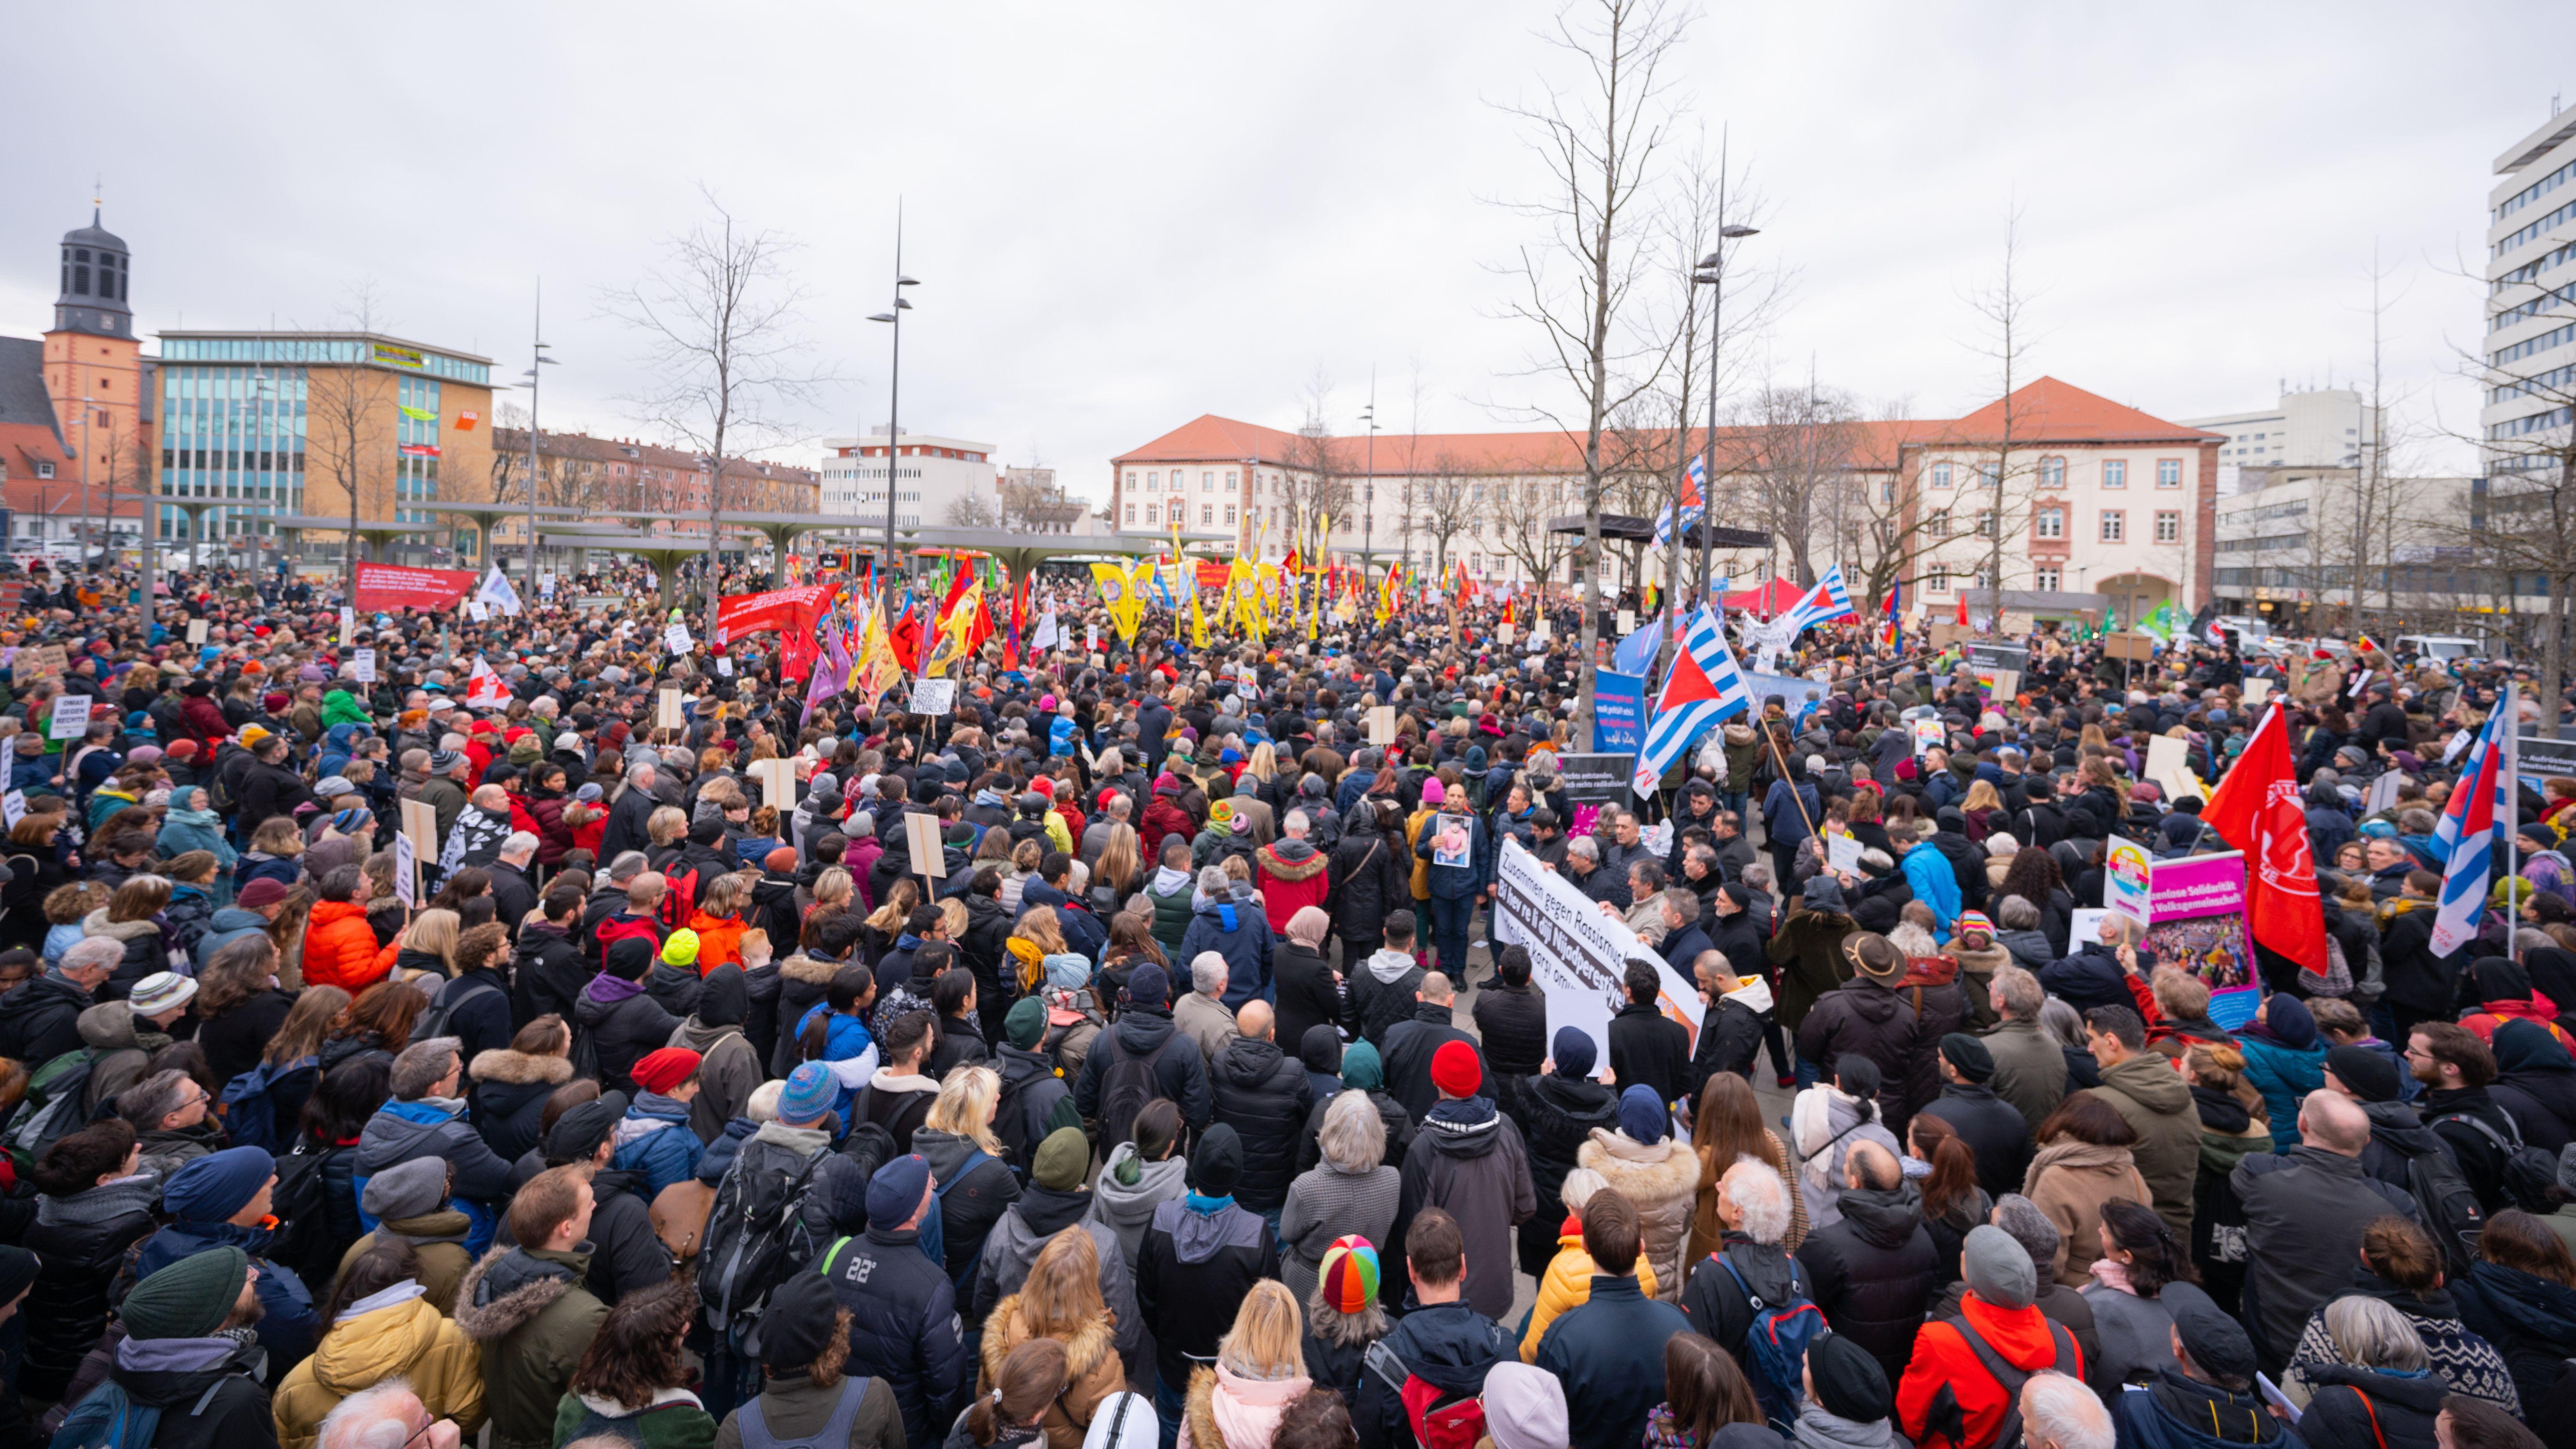 Demonstration in Hanau